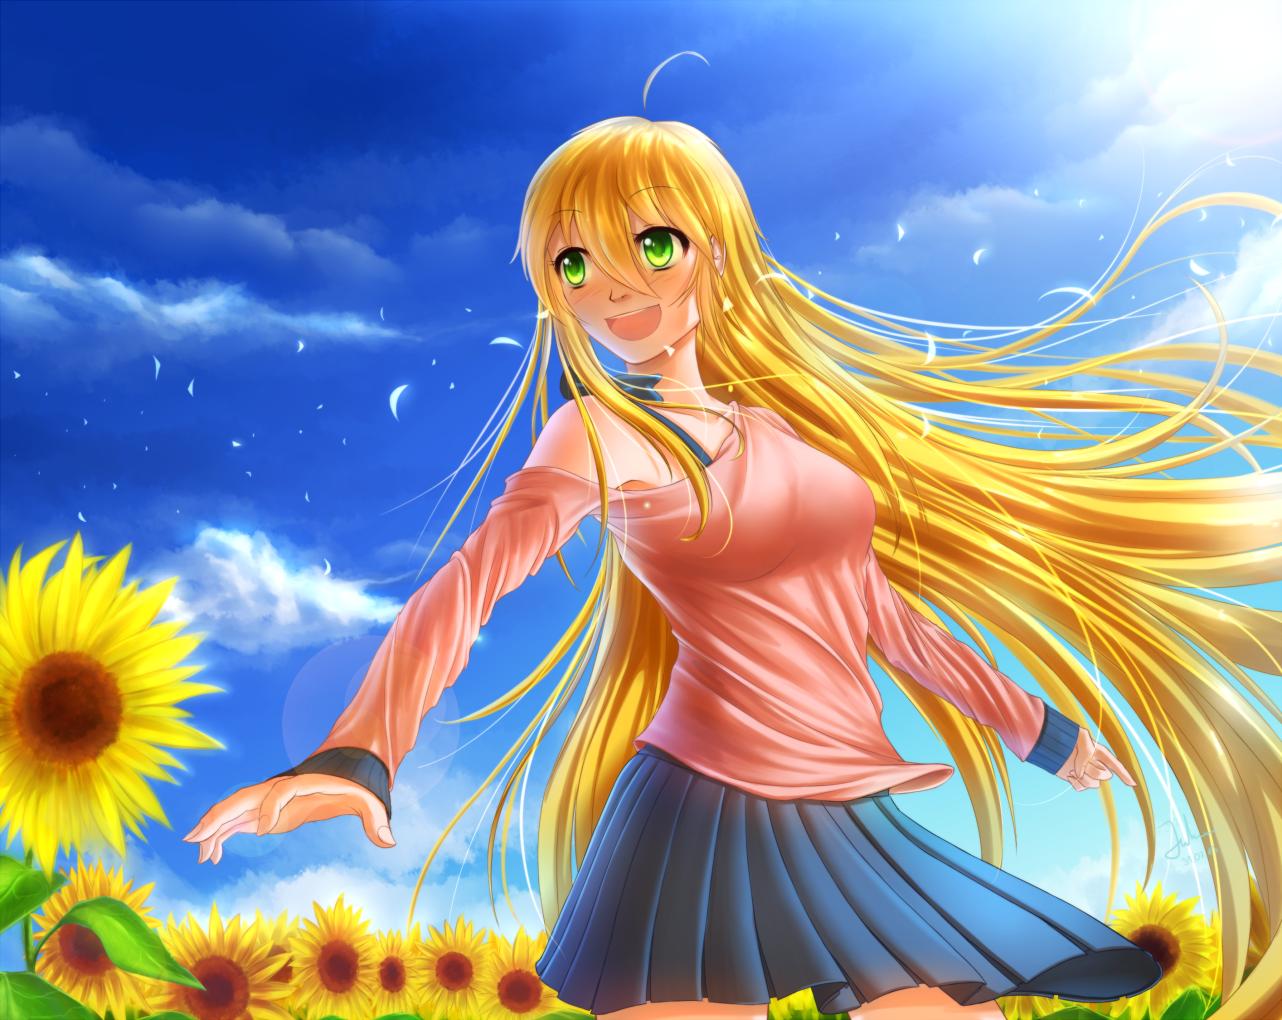 Sunflowers by Juh-Juh